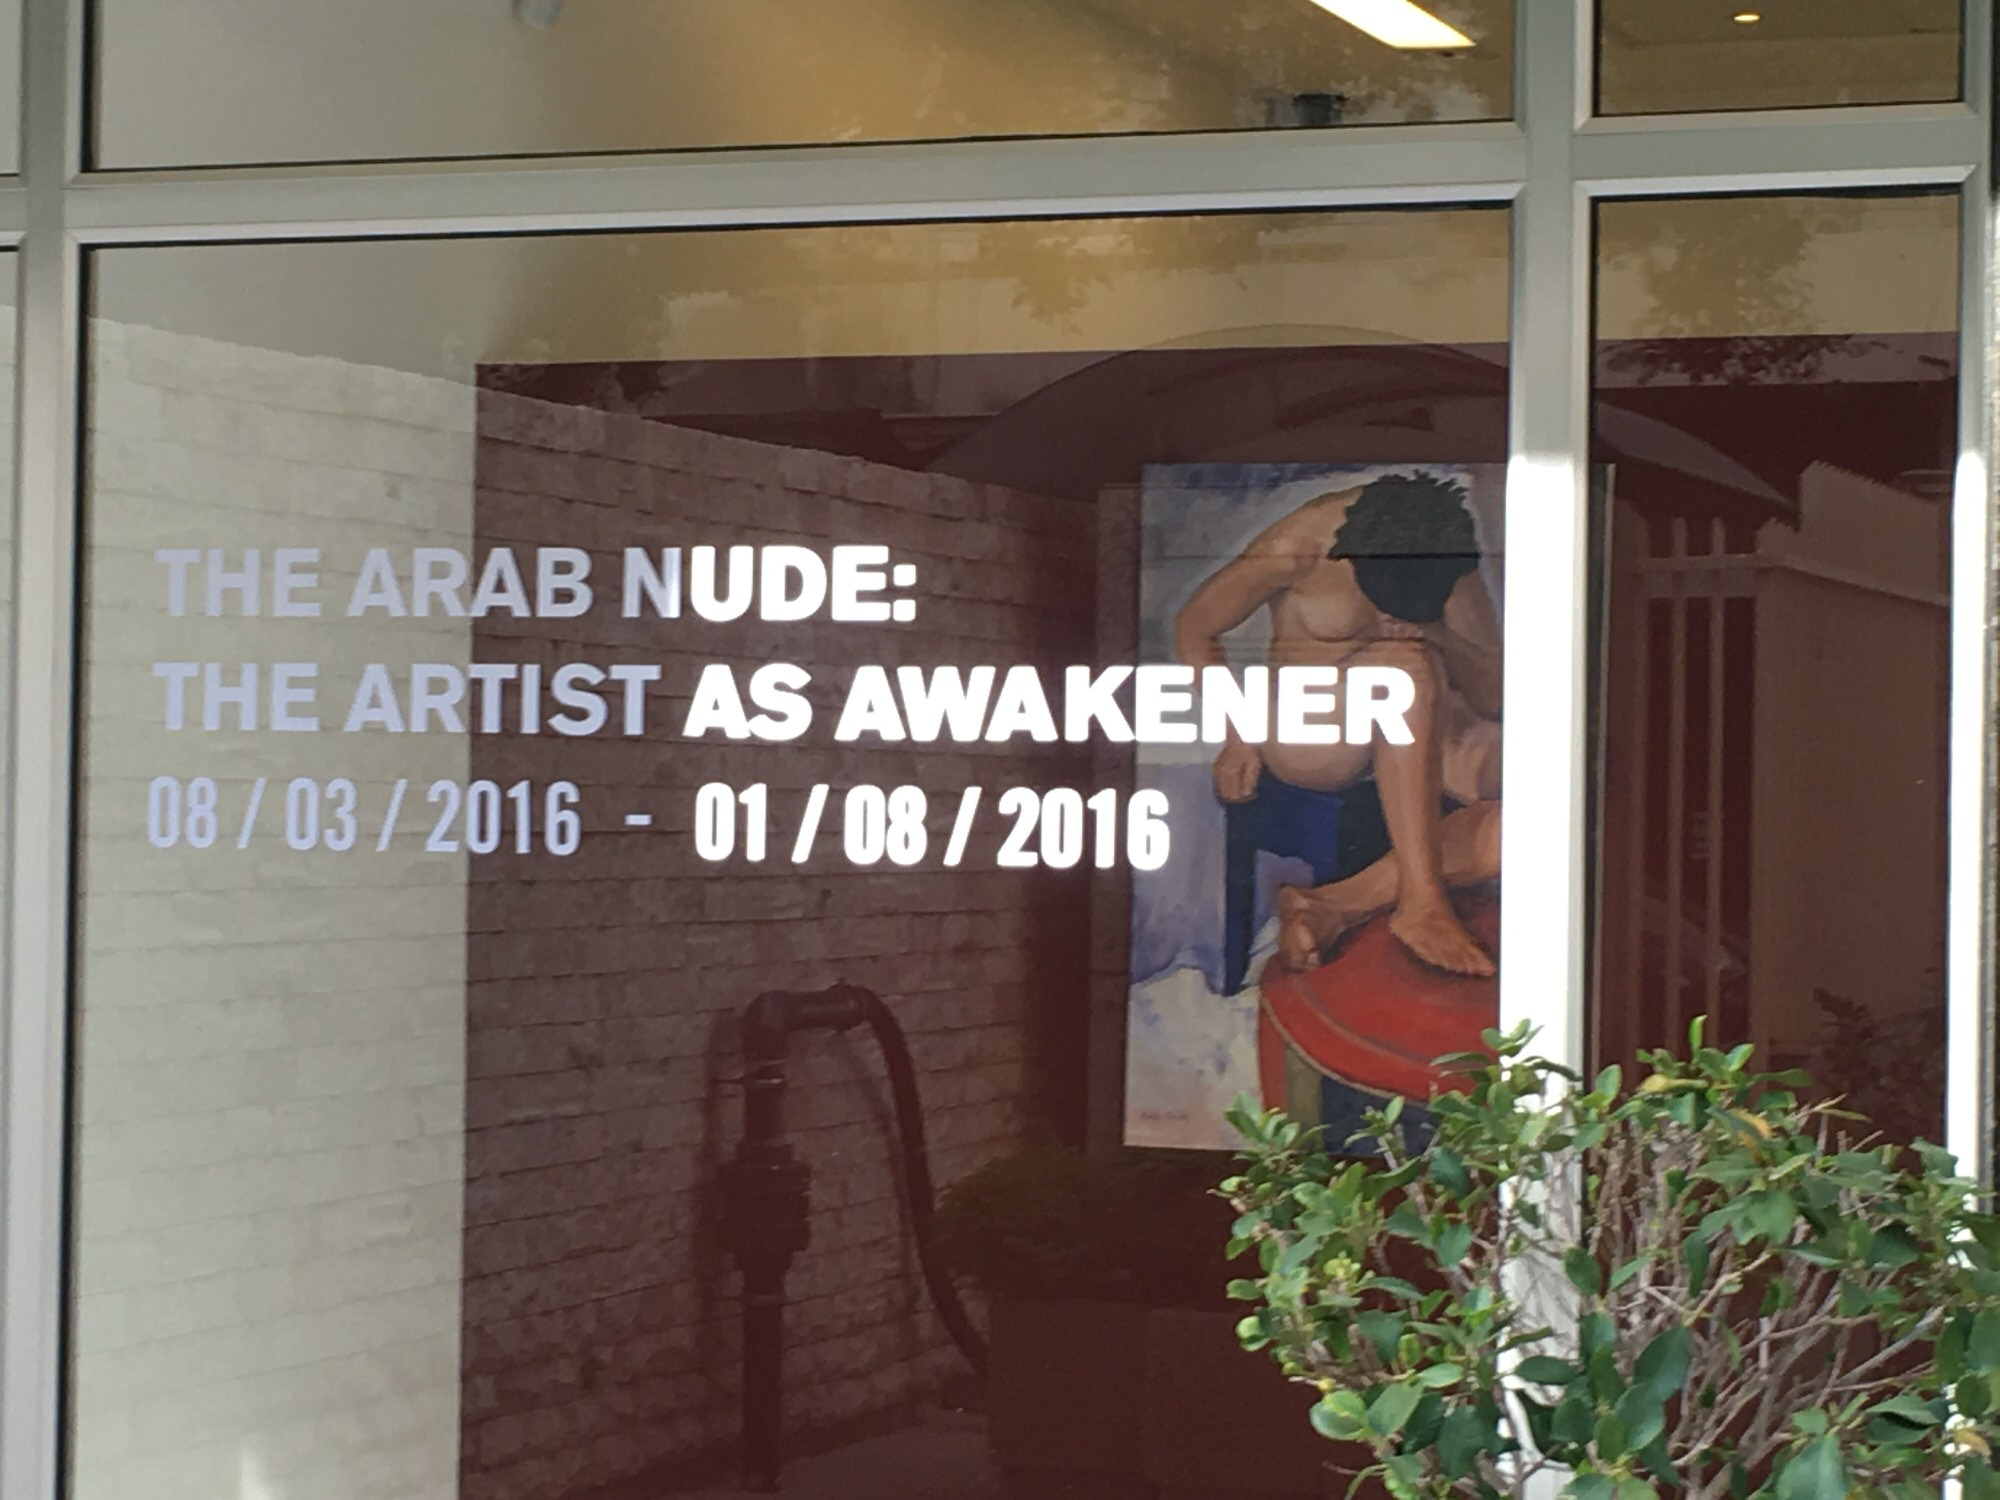 The Arab Nude: The Artist as Awakener @Kirsten Scheid